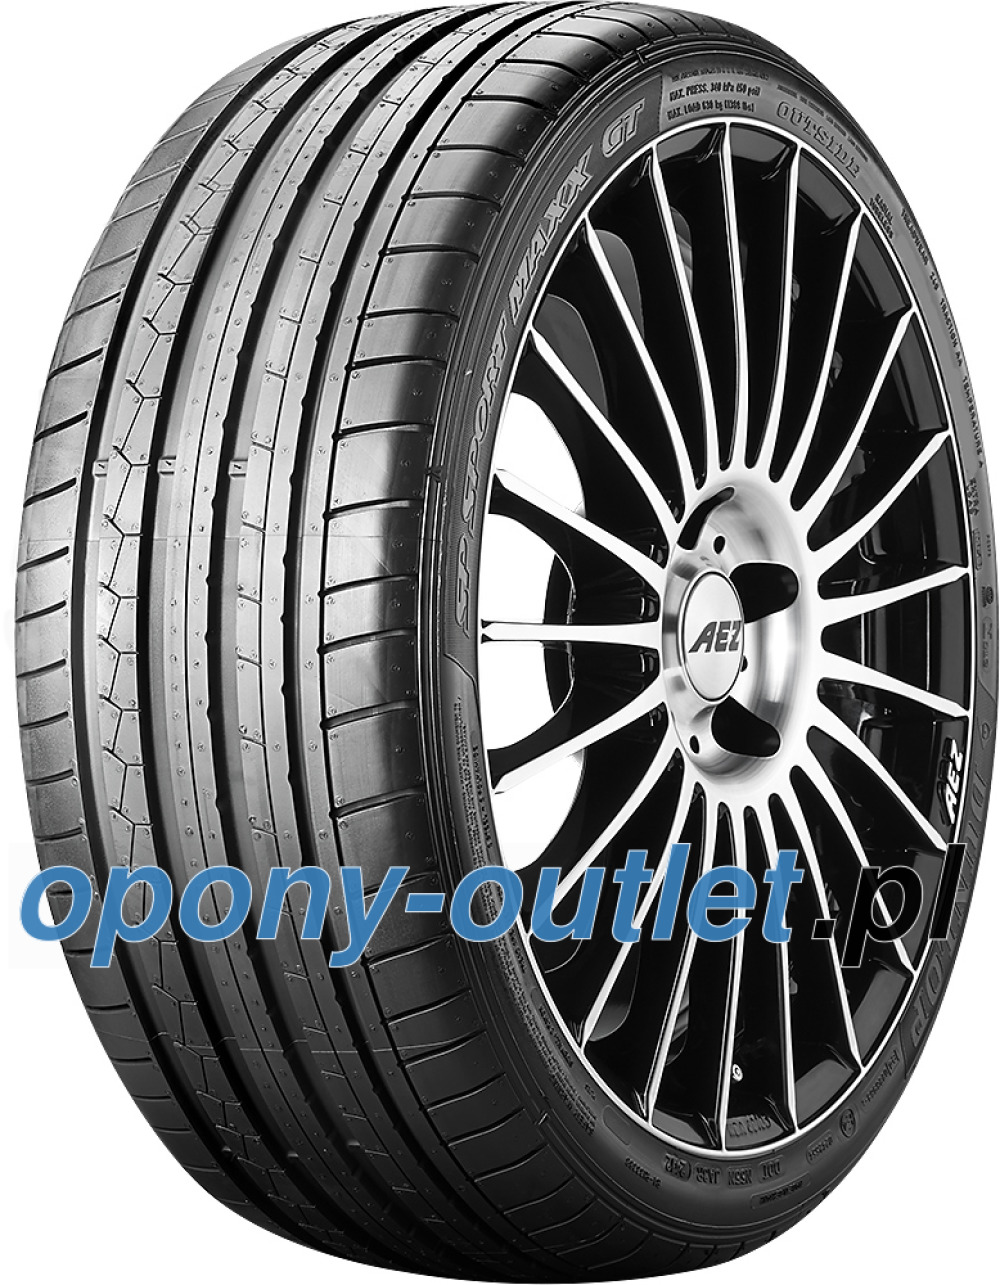 Dunlop SP Sport Maxx GT ( 265/35 R20 99Y XL osłona felgi (MFS), AO BLT )